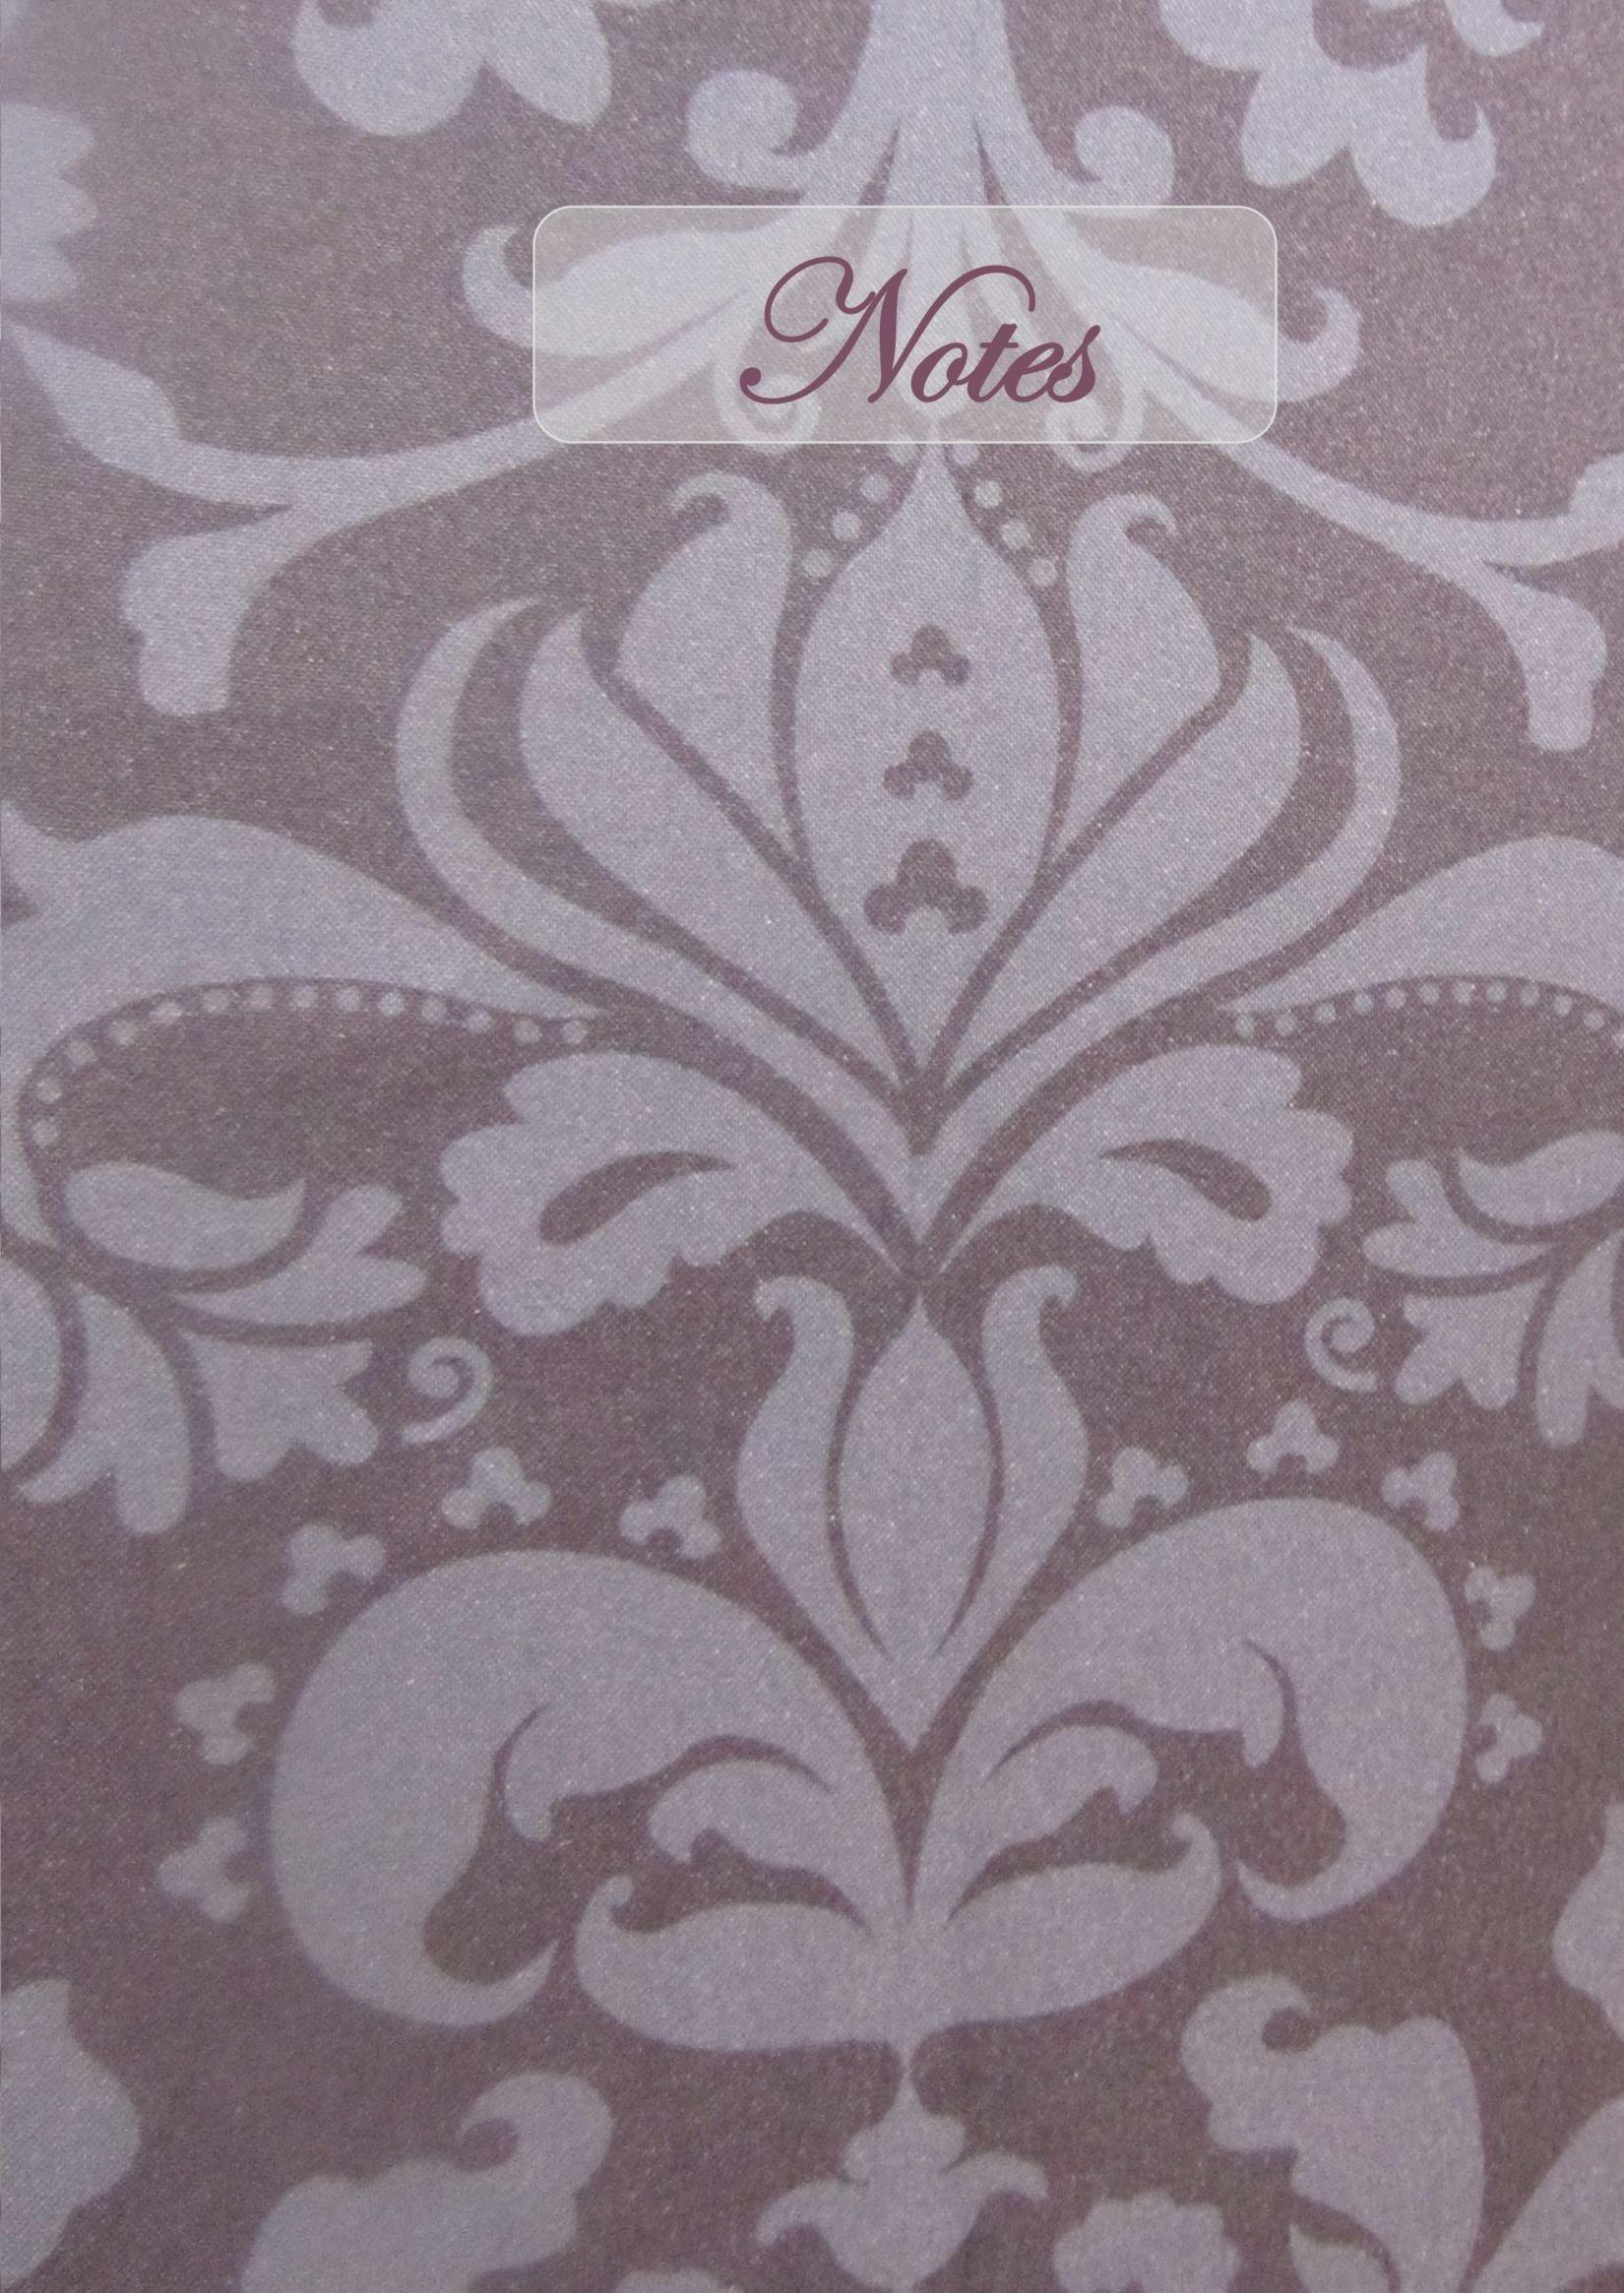 Notizbuch - Royal Notes: DIN A4, liniert, 108 Seiten (German Edition) pdf